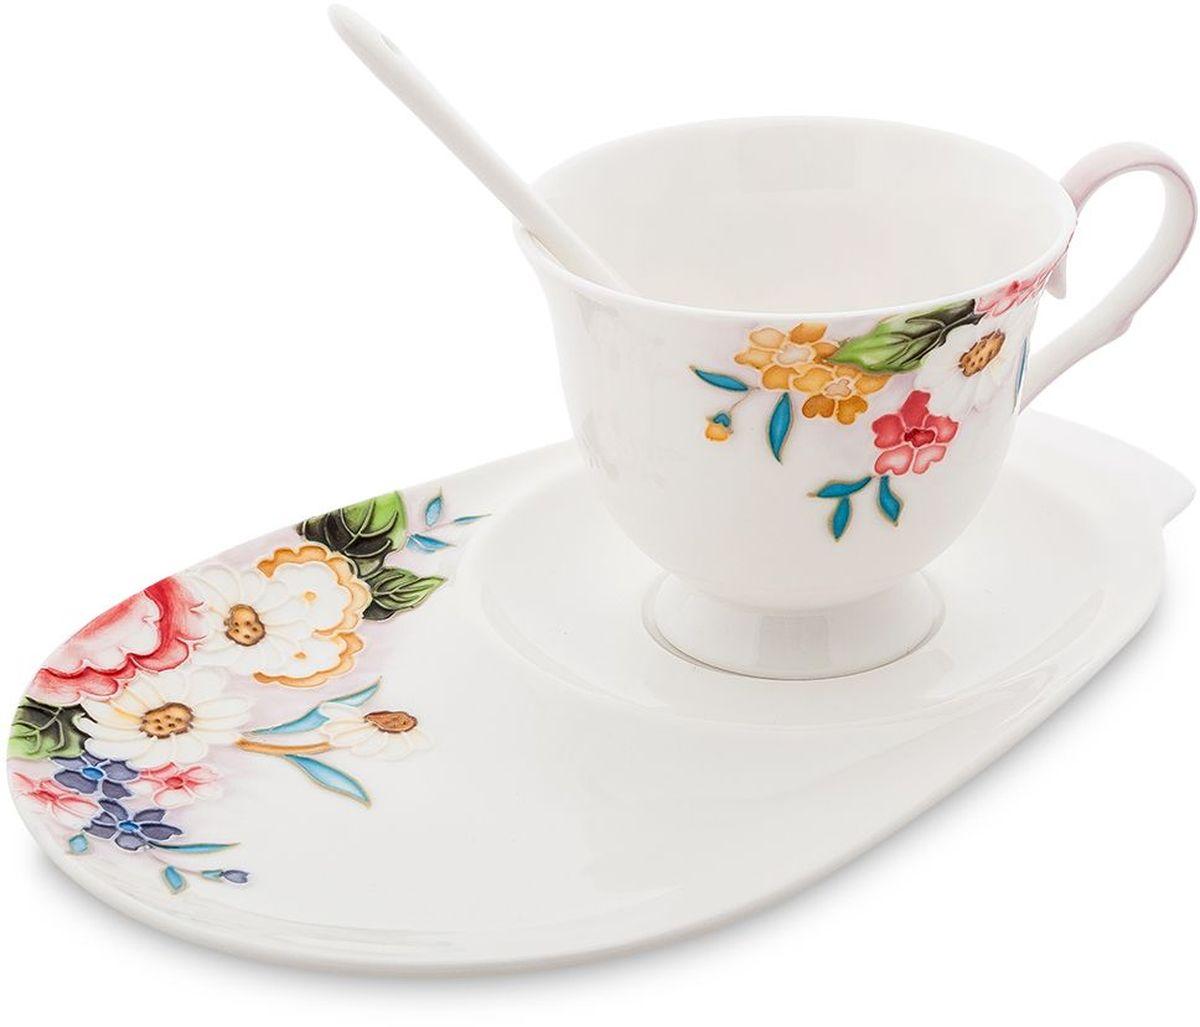 Чайная пара Pavone Королева Камилла, 3 предмета. 451594115510Объем чашки: 250 мл Длина блюдца: 23 см